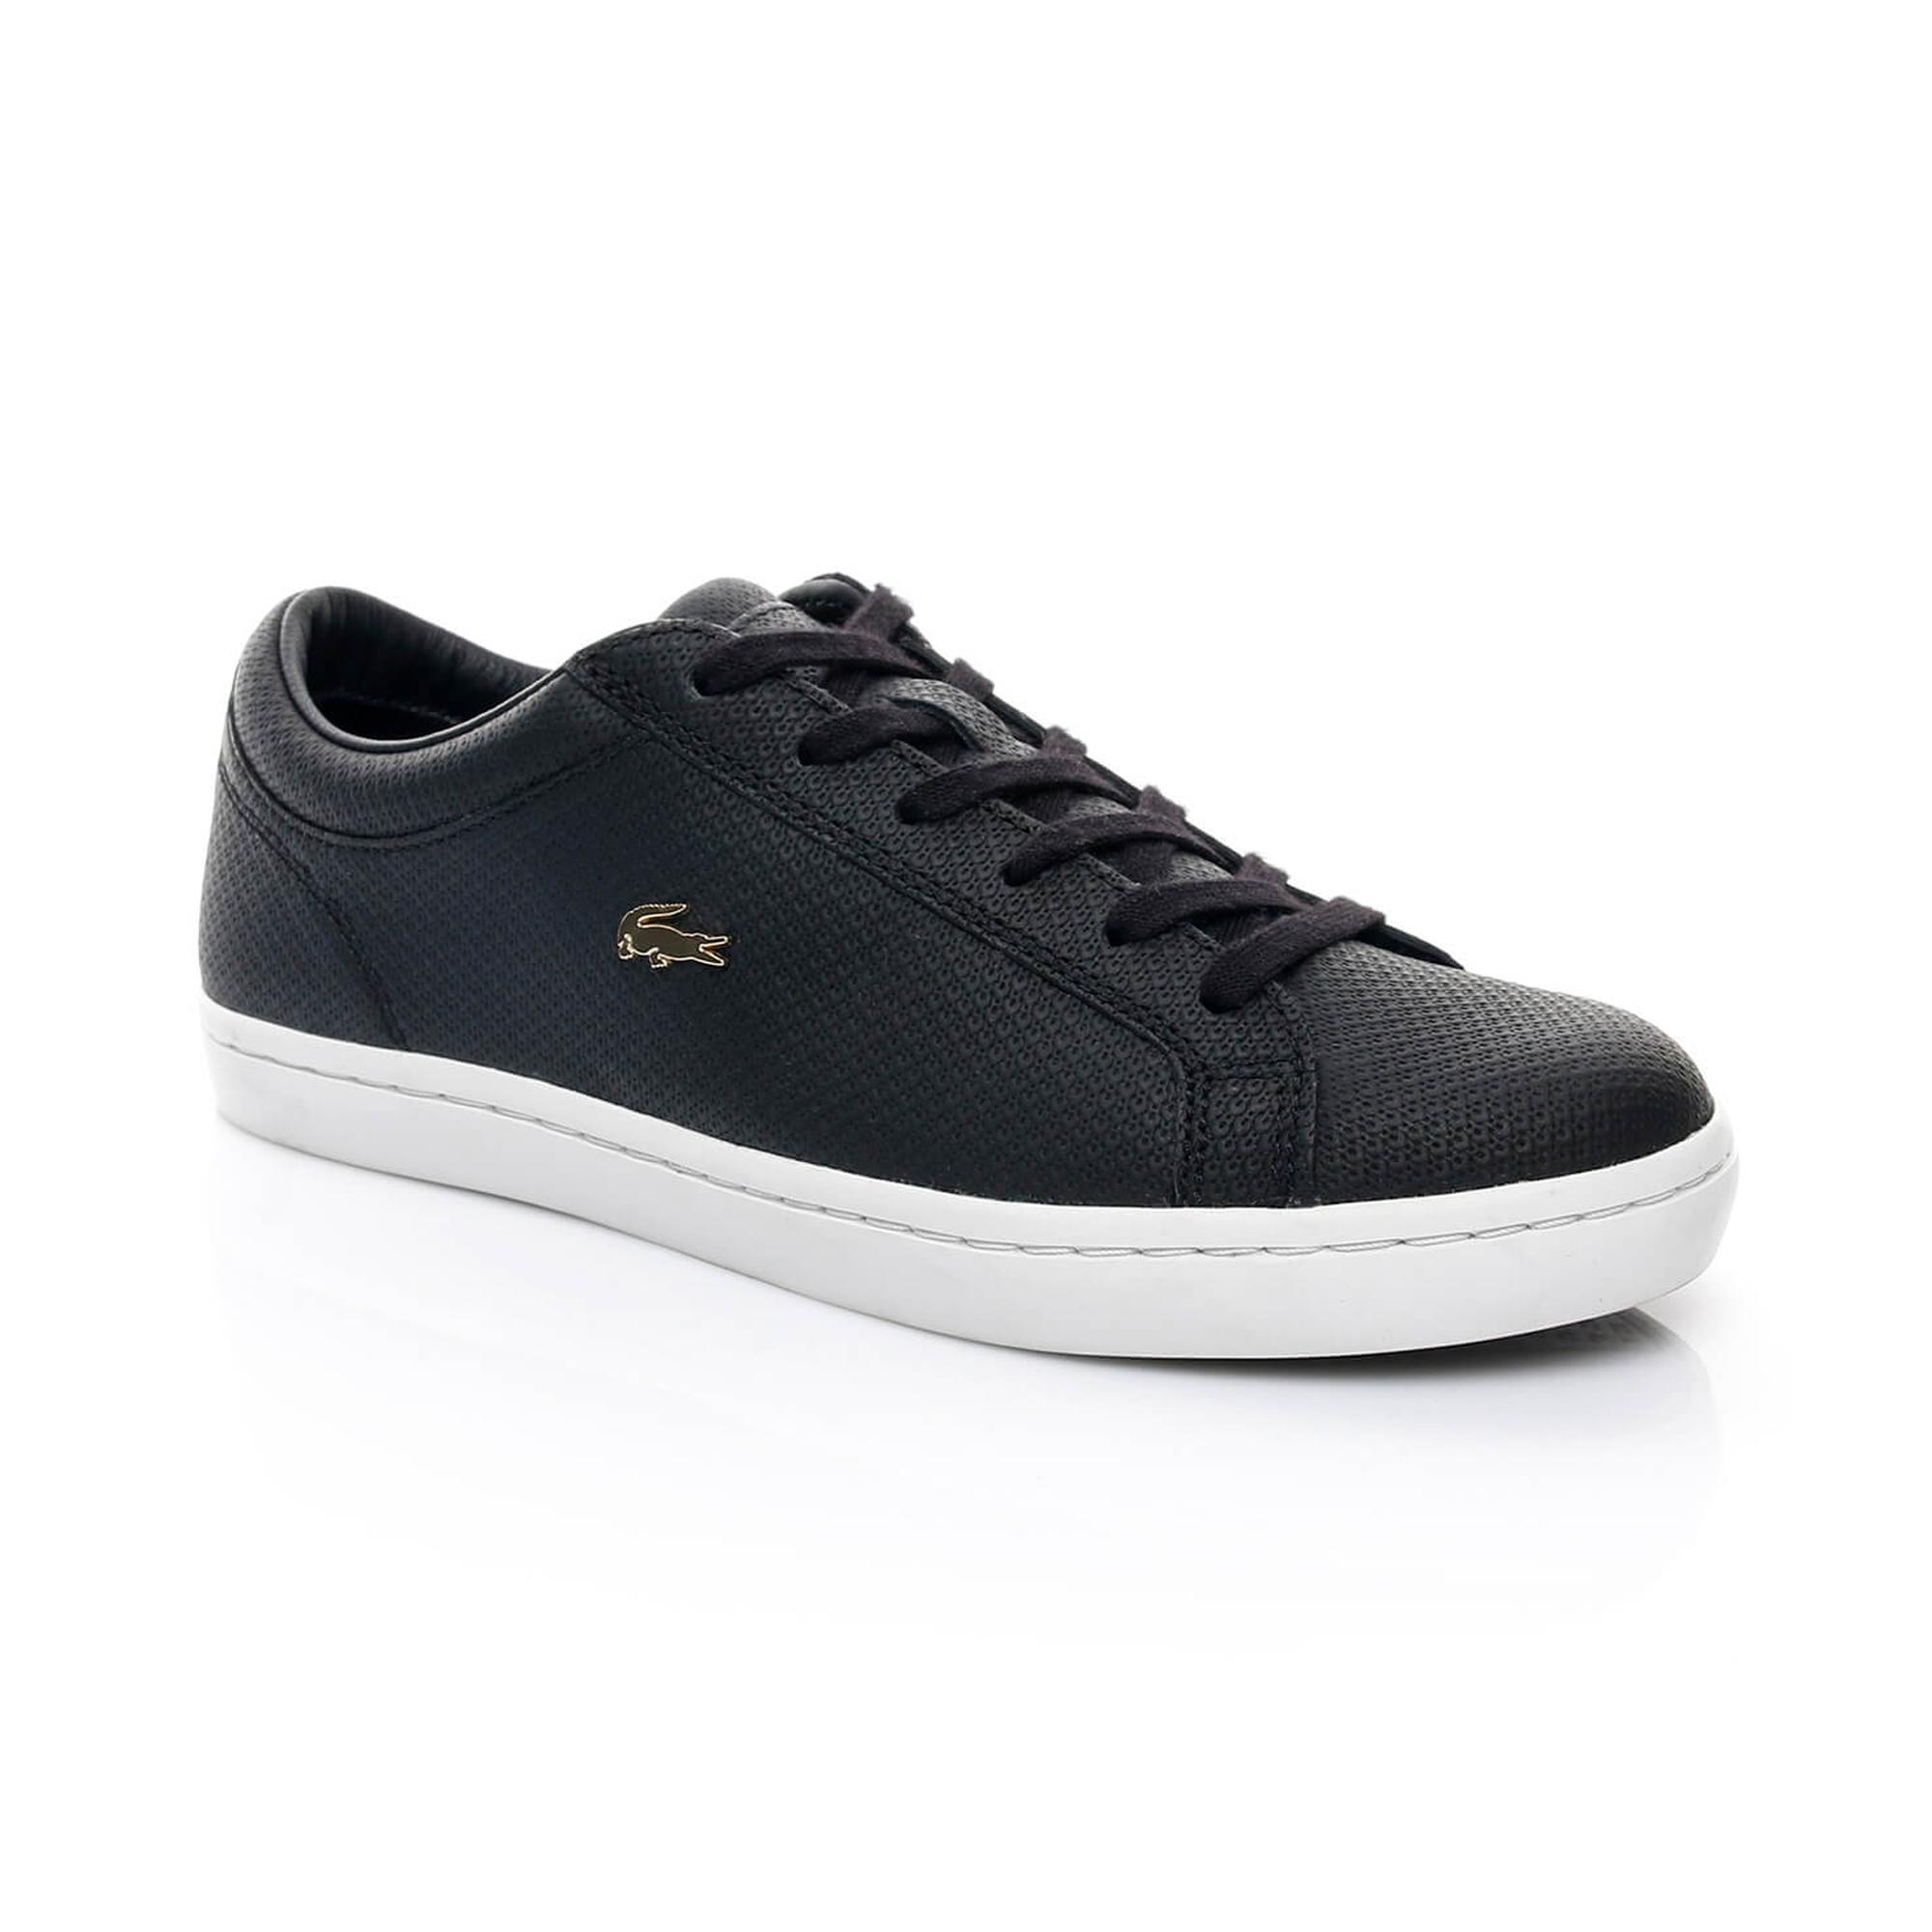 Lacoste STRAIGHTSET 316 3 Damskie Sneakersy